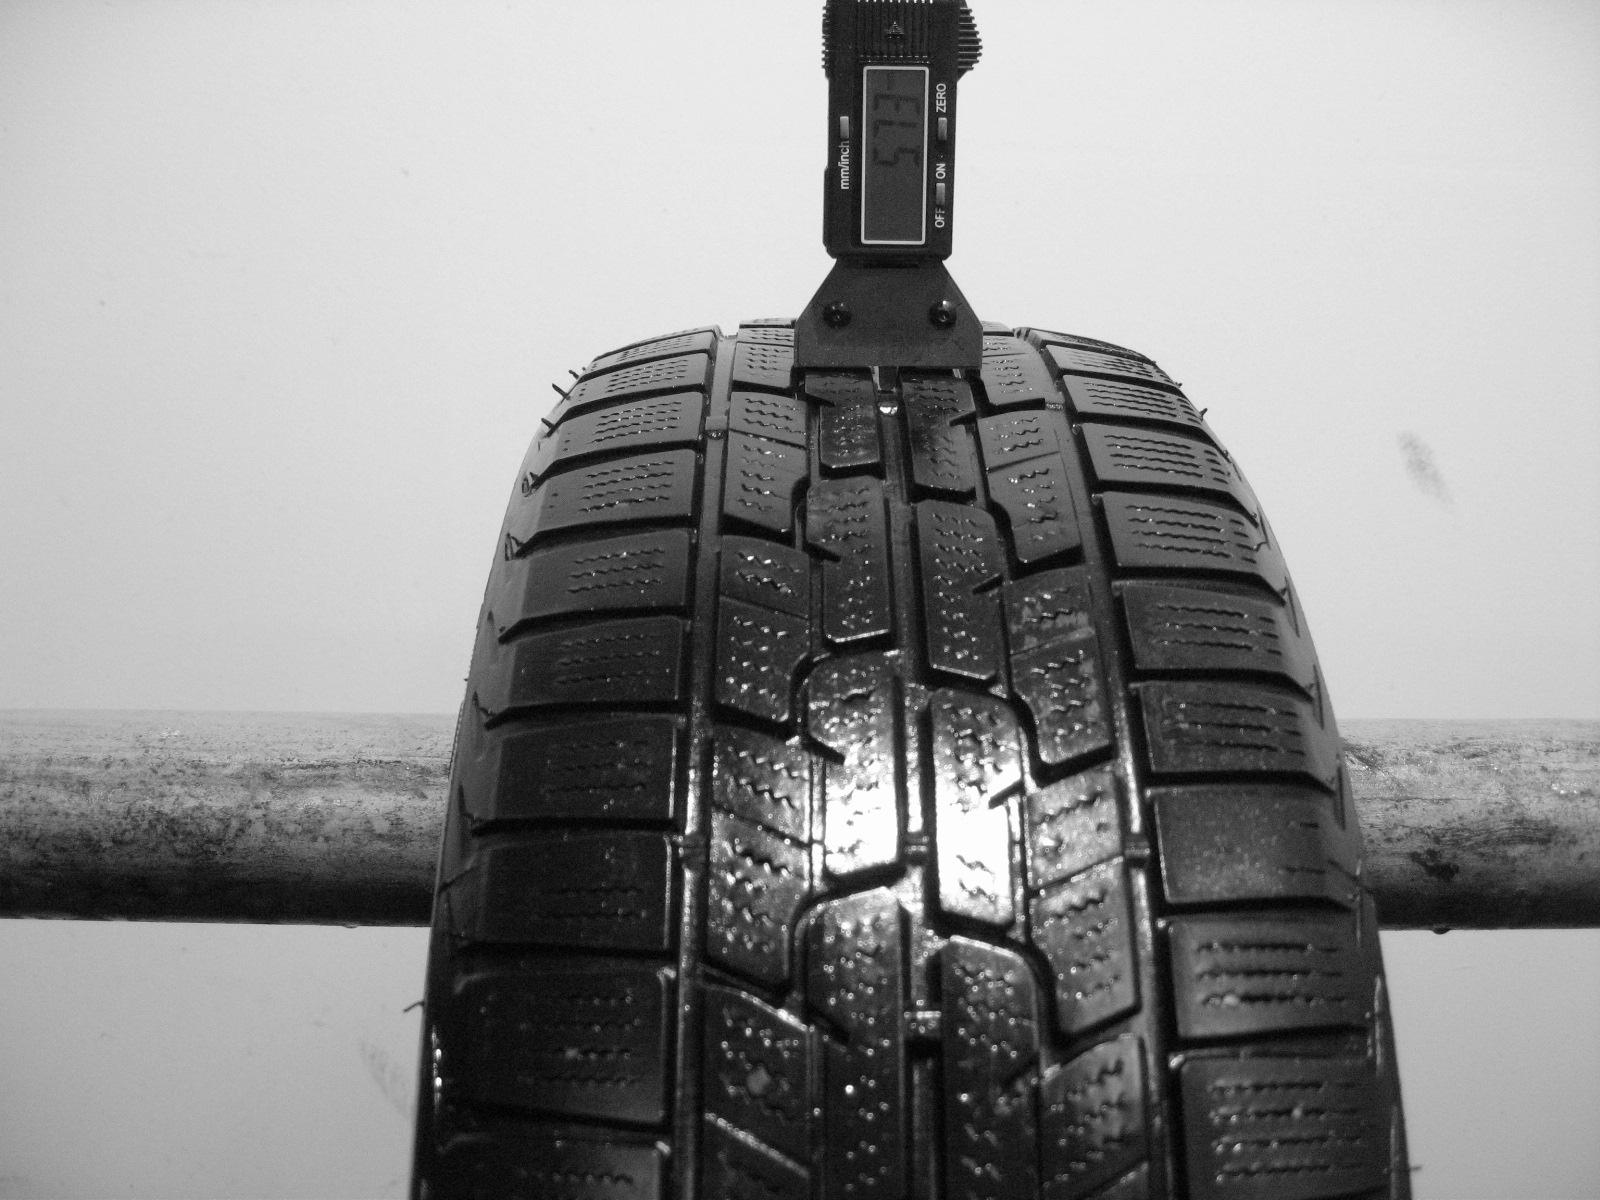 Použité-Pneu-Bazar - 185/60 R14 FIRESTONE WINTERHAWK 2 EVO -kusovka-rezerva 3mm